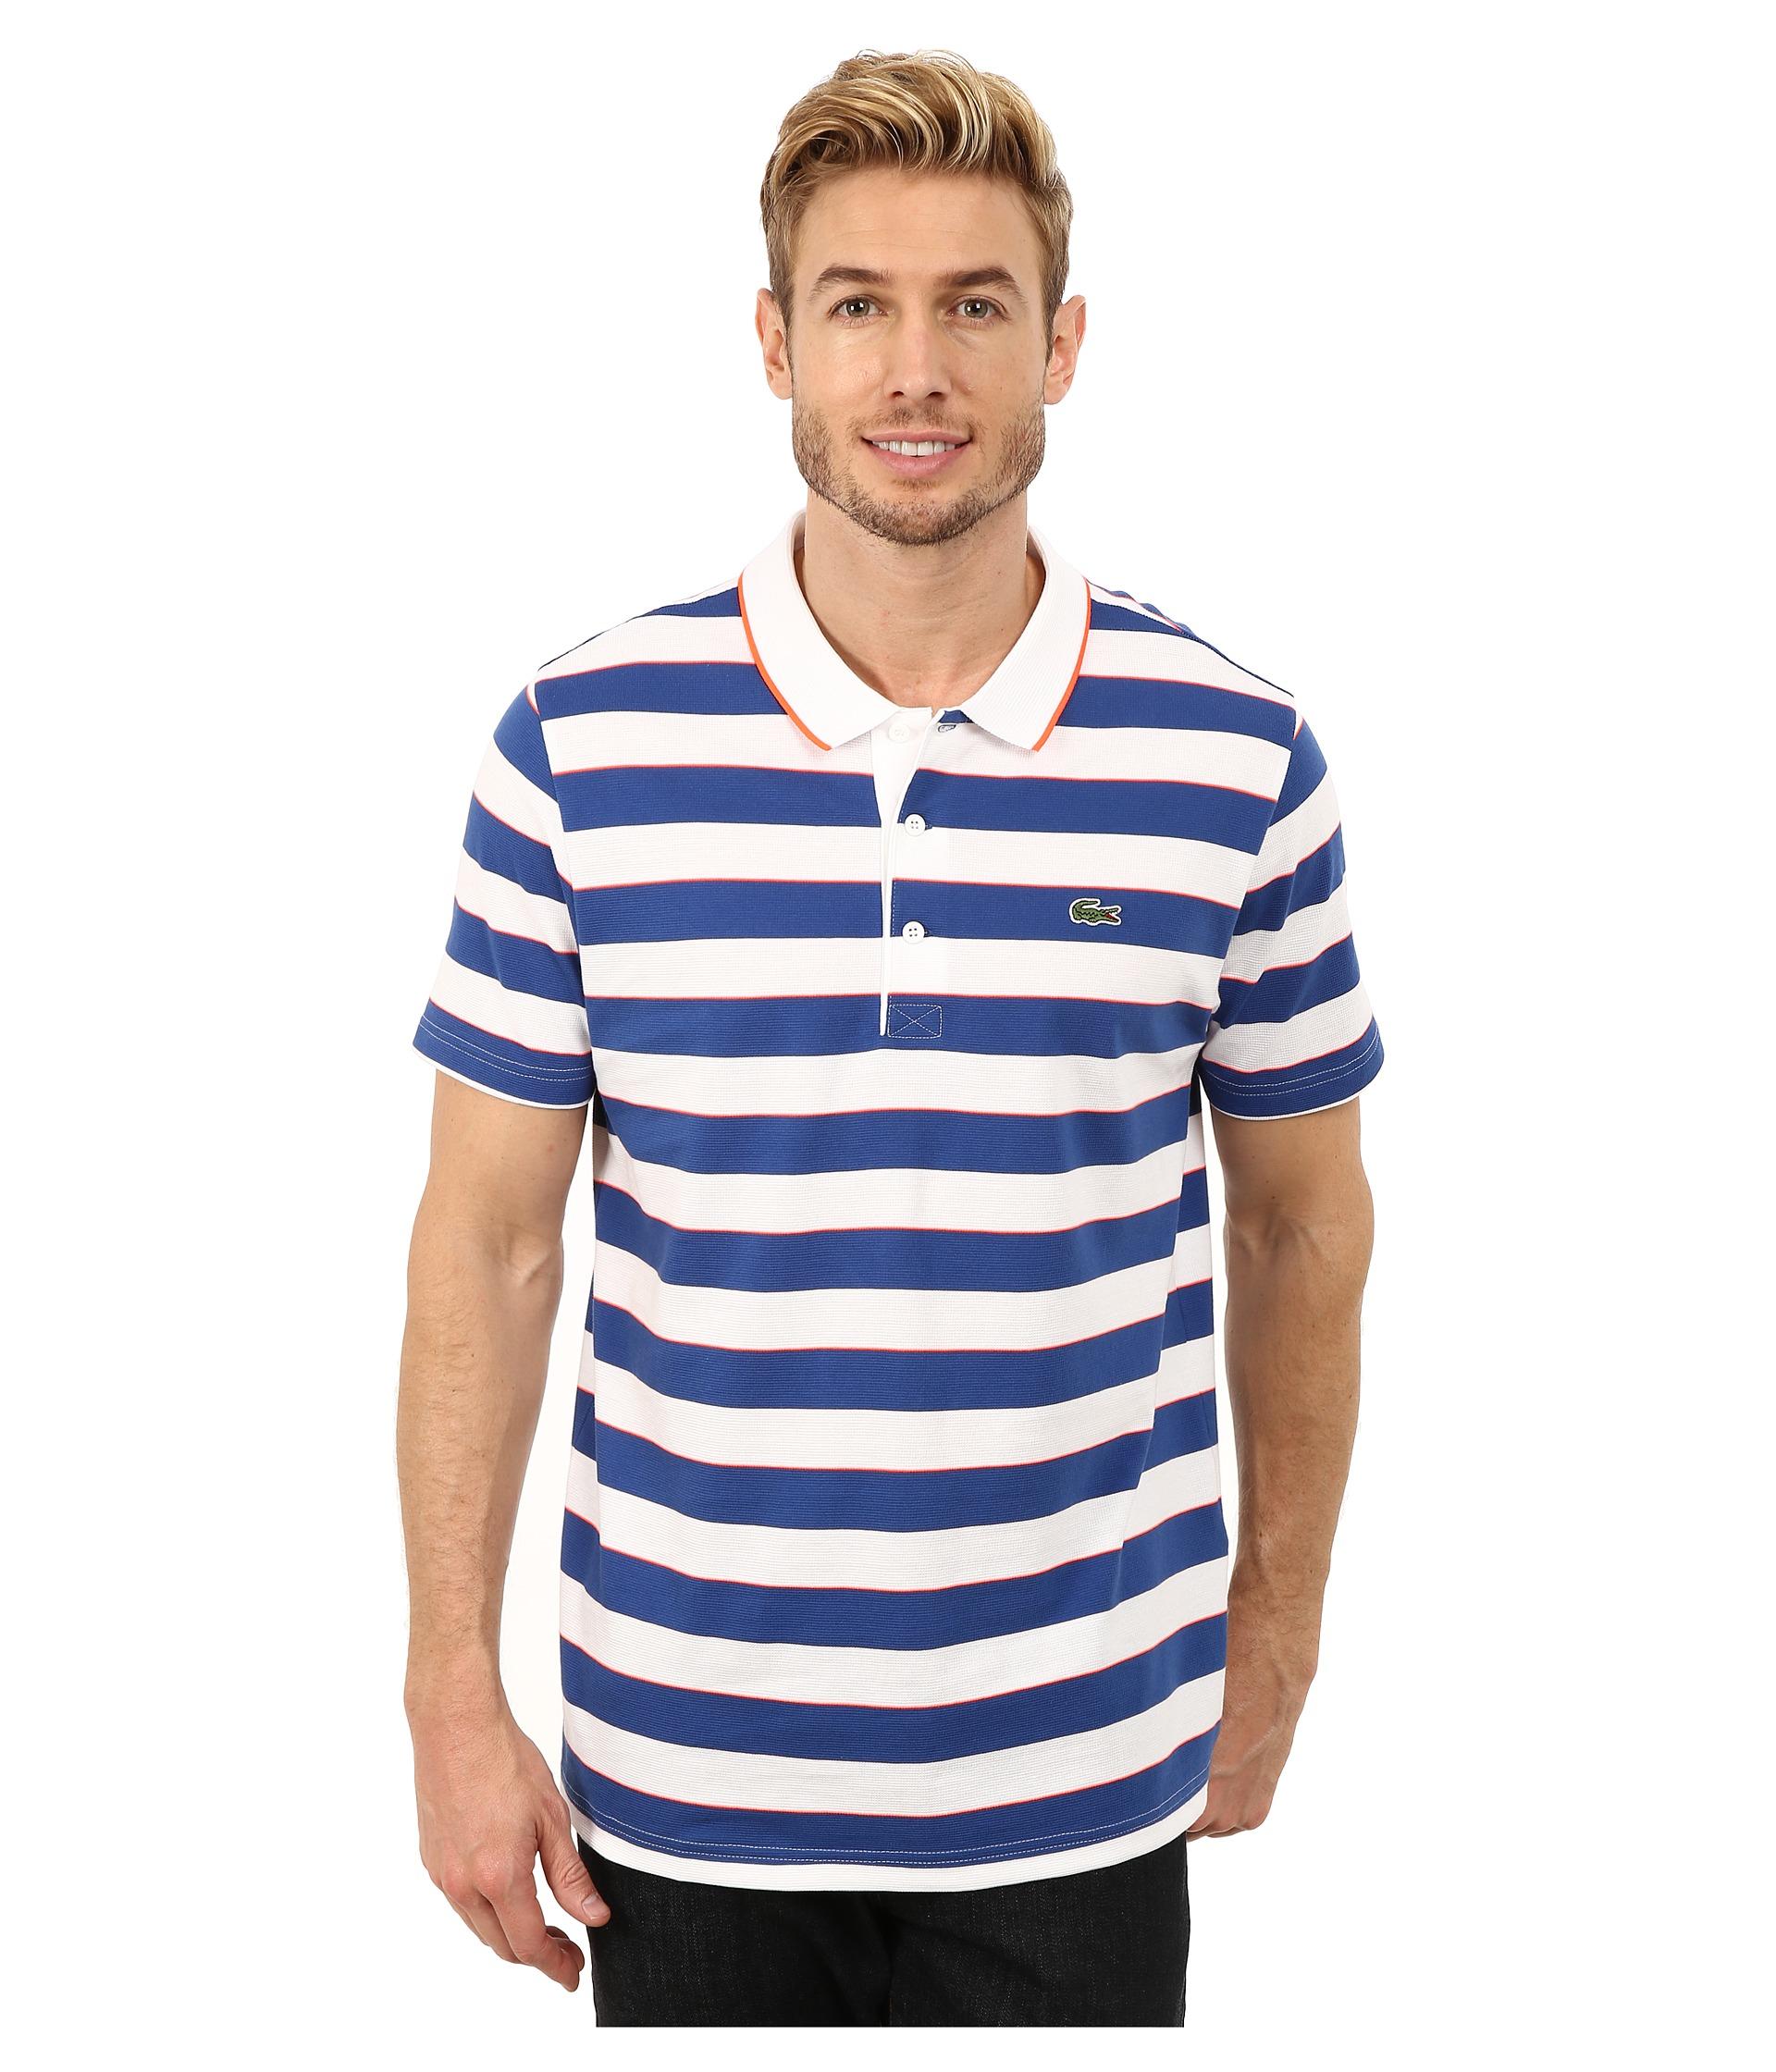 3d7422eaf6 Lacoste Sport Short Sleeve Superlight Stripe Polo in Blue for Men - Lyst